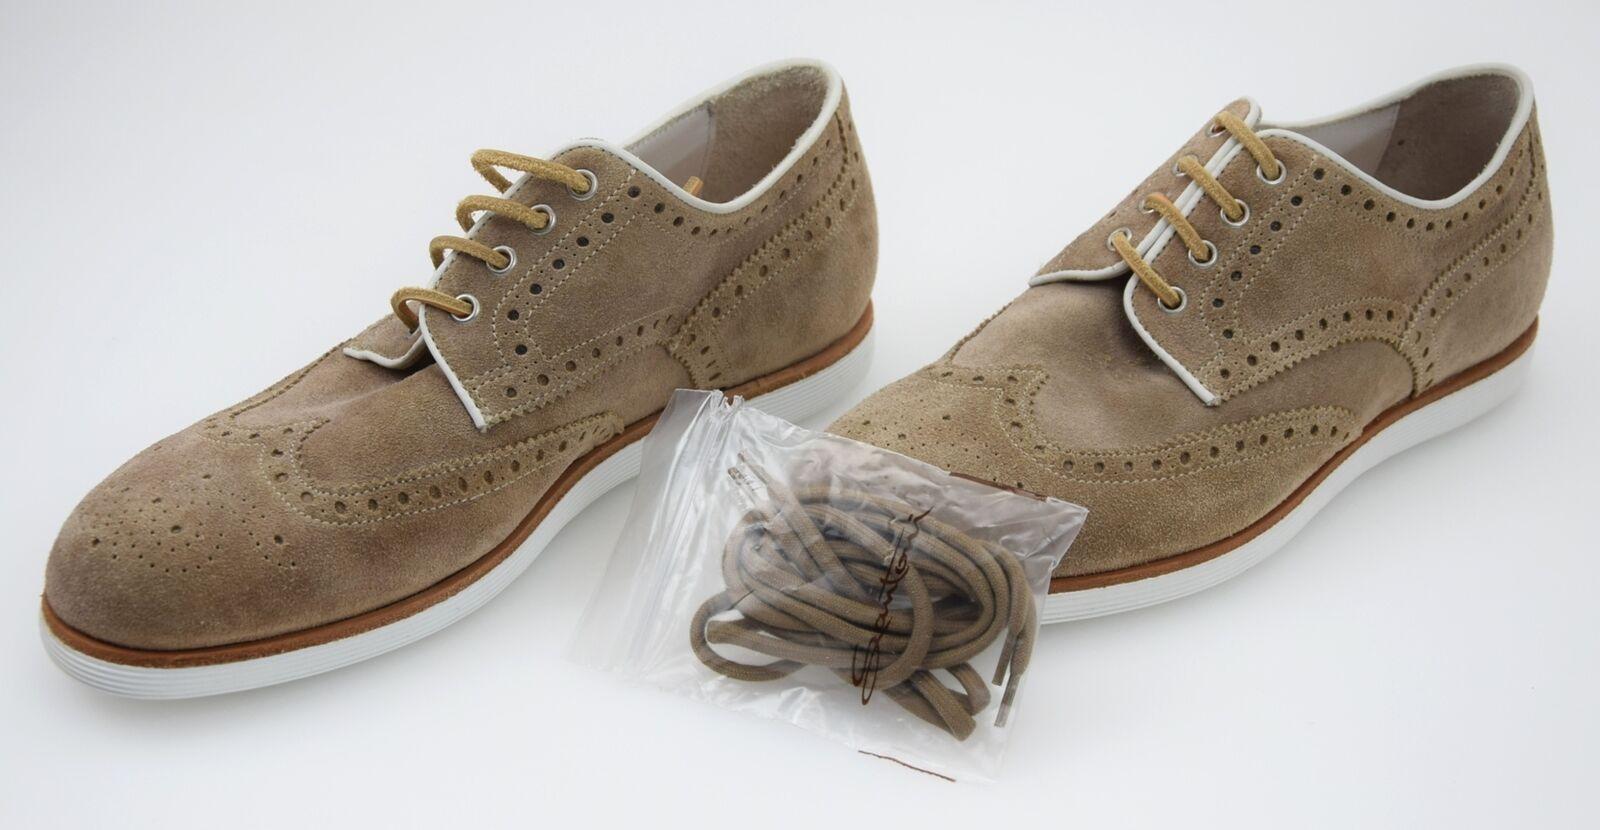 SANTONI MAN BUSINESS DERBY CLASSIC FORMAL DRESS DRESS DRESS schuhe SUEDE MBSD12096BIANRNYC55 1b9d64